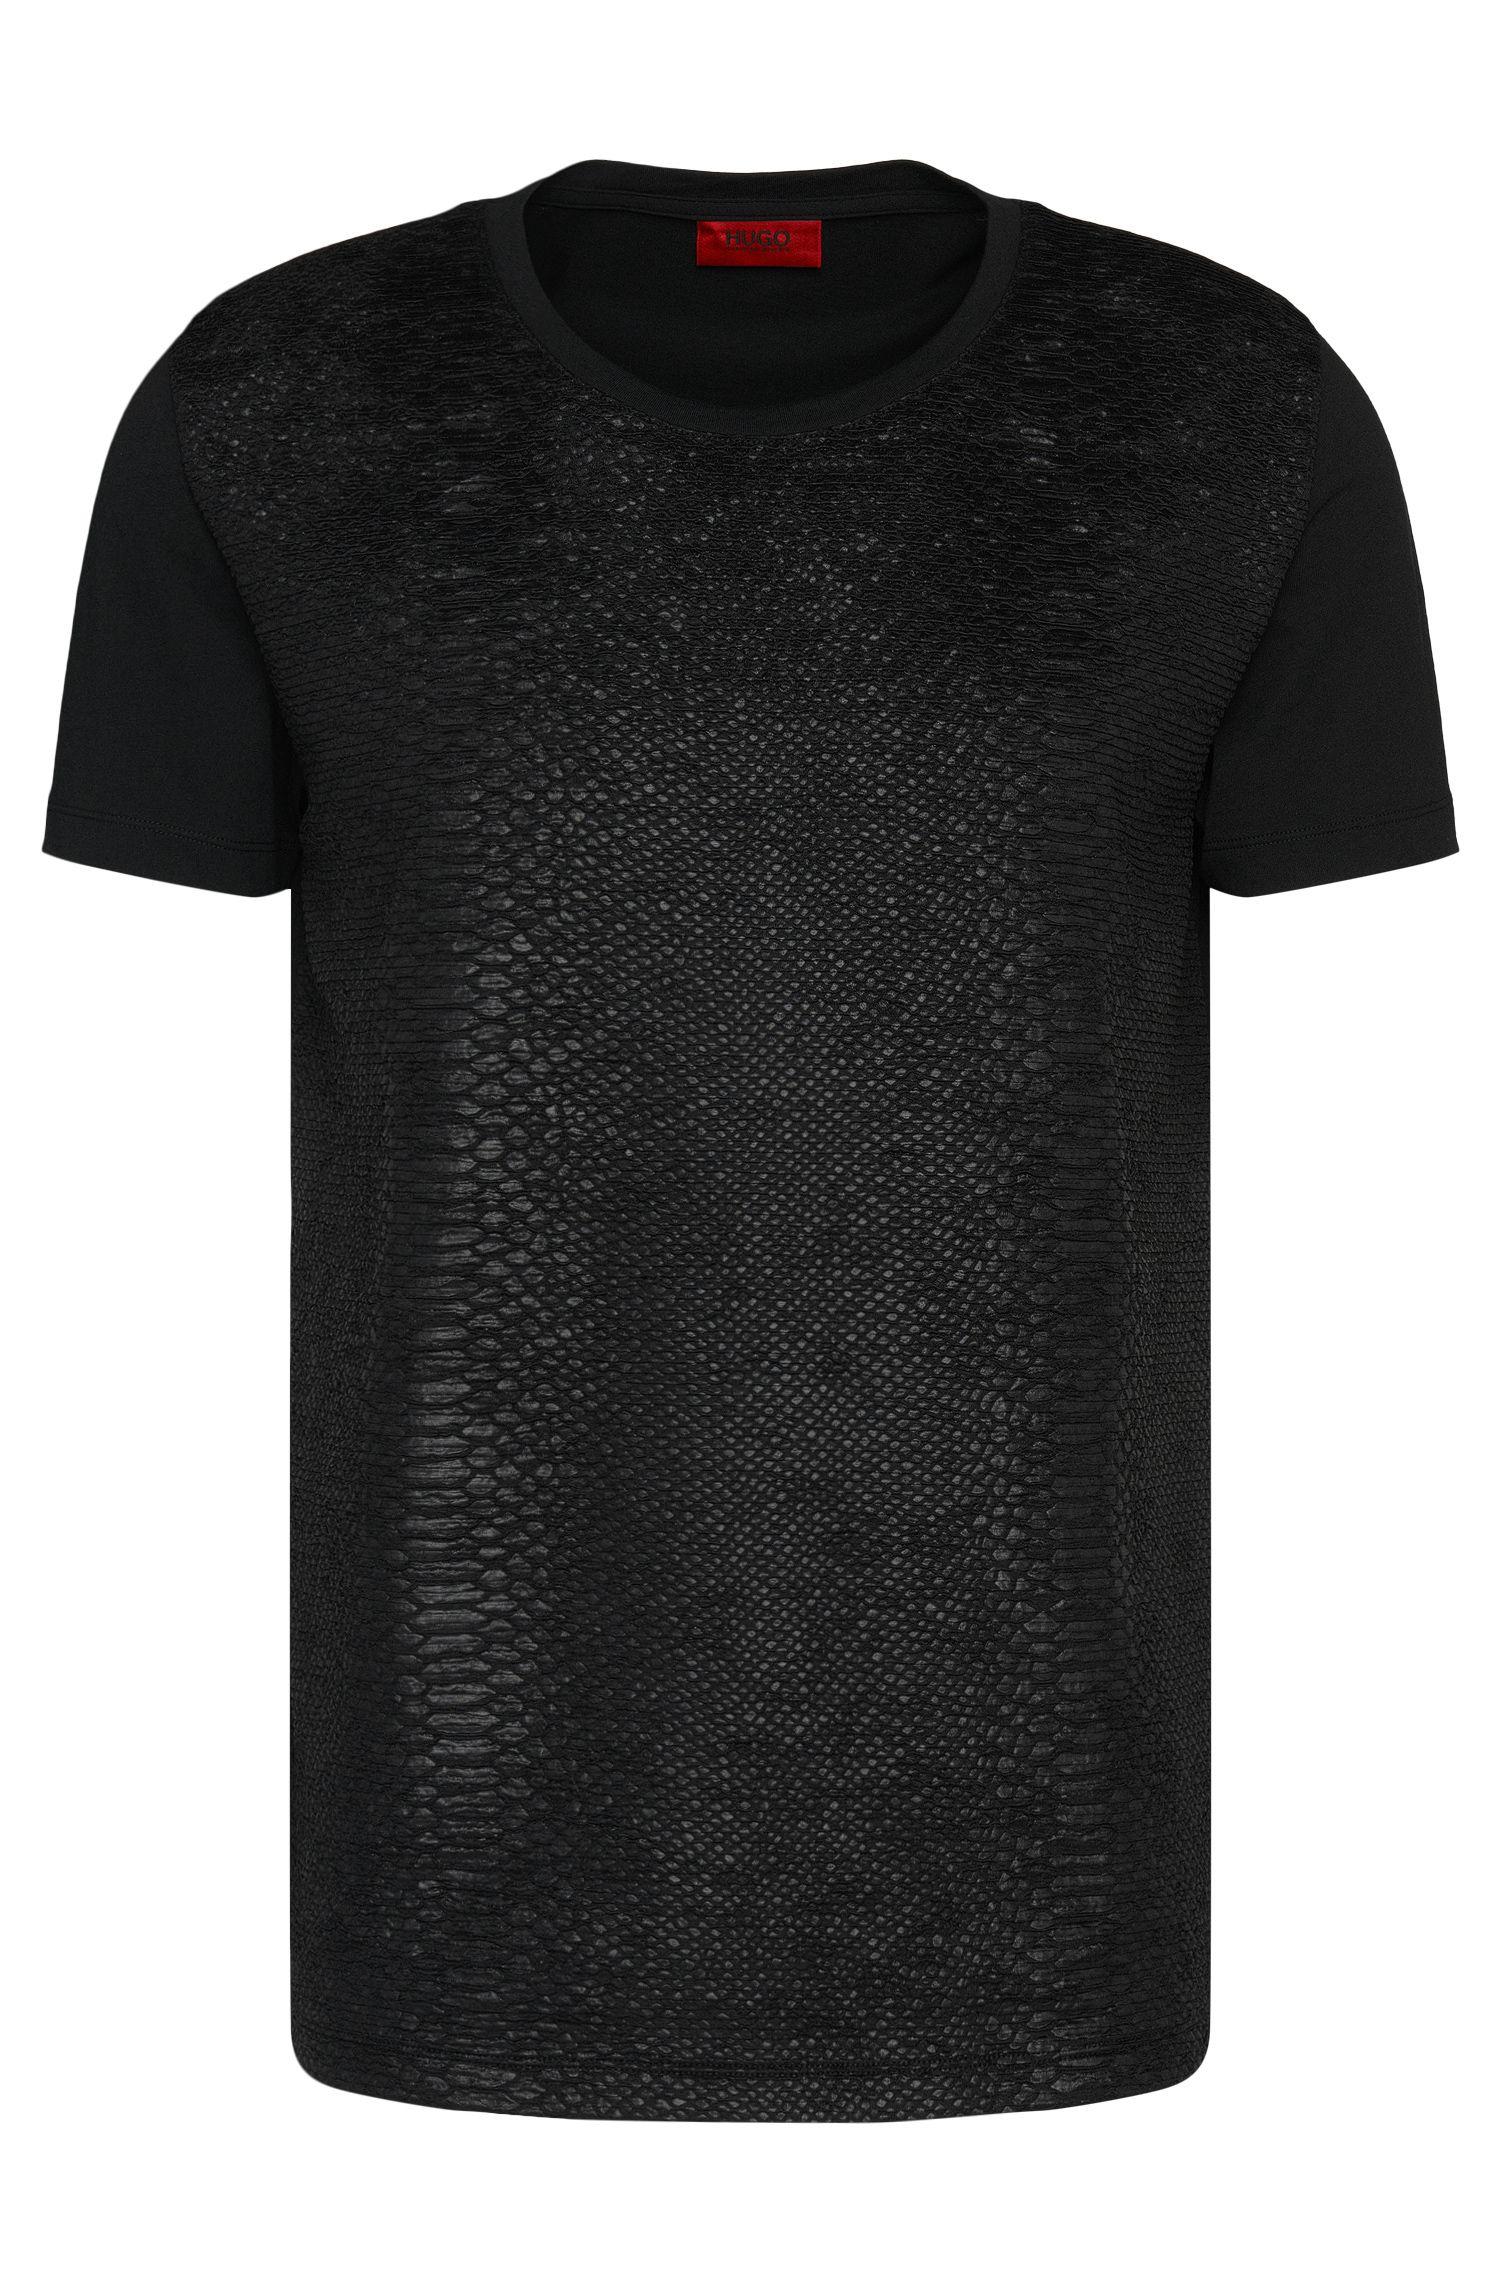 'Desert'   Cotton Snakeskin Textured T-Shirt